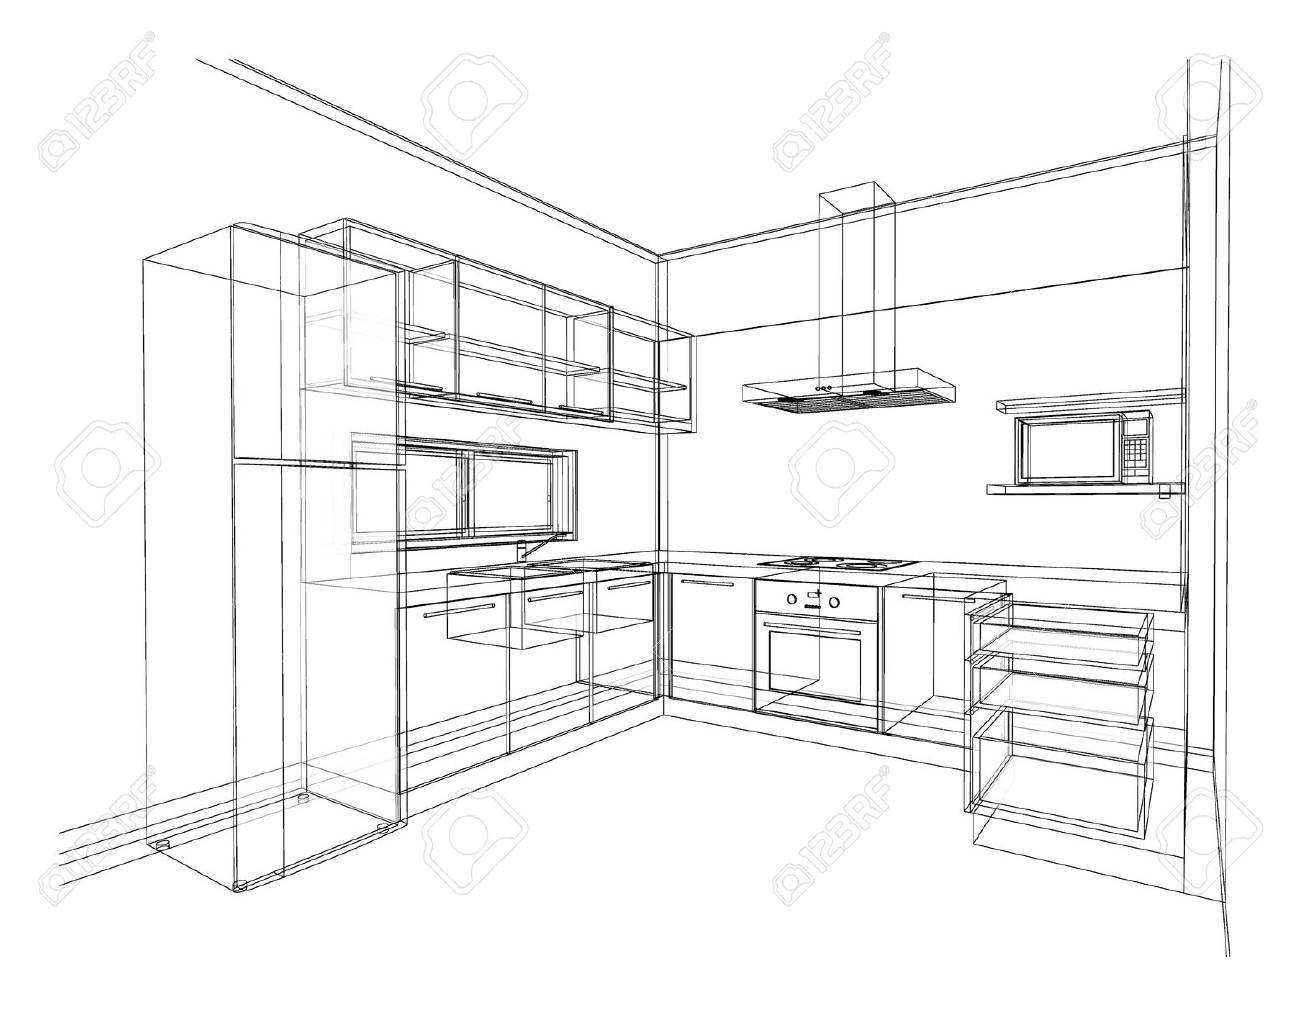 Interior design of modern style kitchen, 3D wire frame sketch, perspective - 65989605